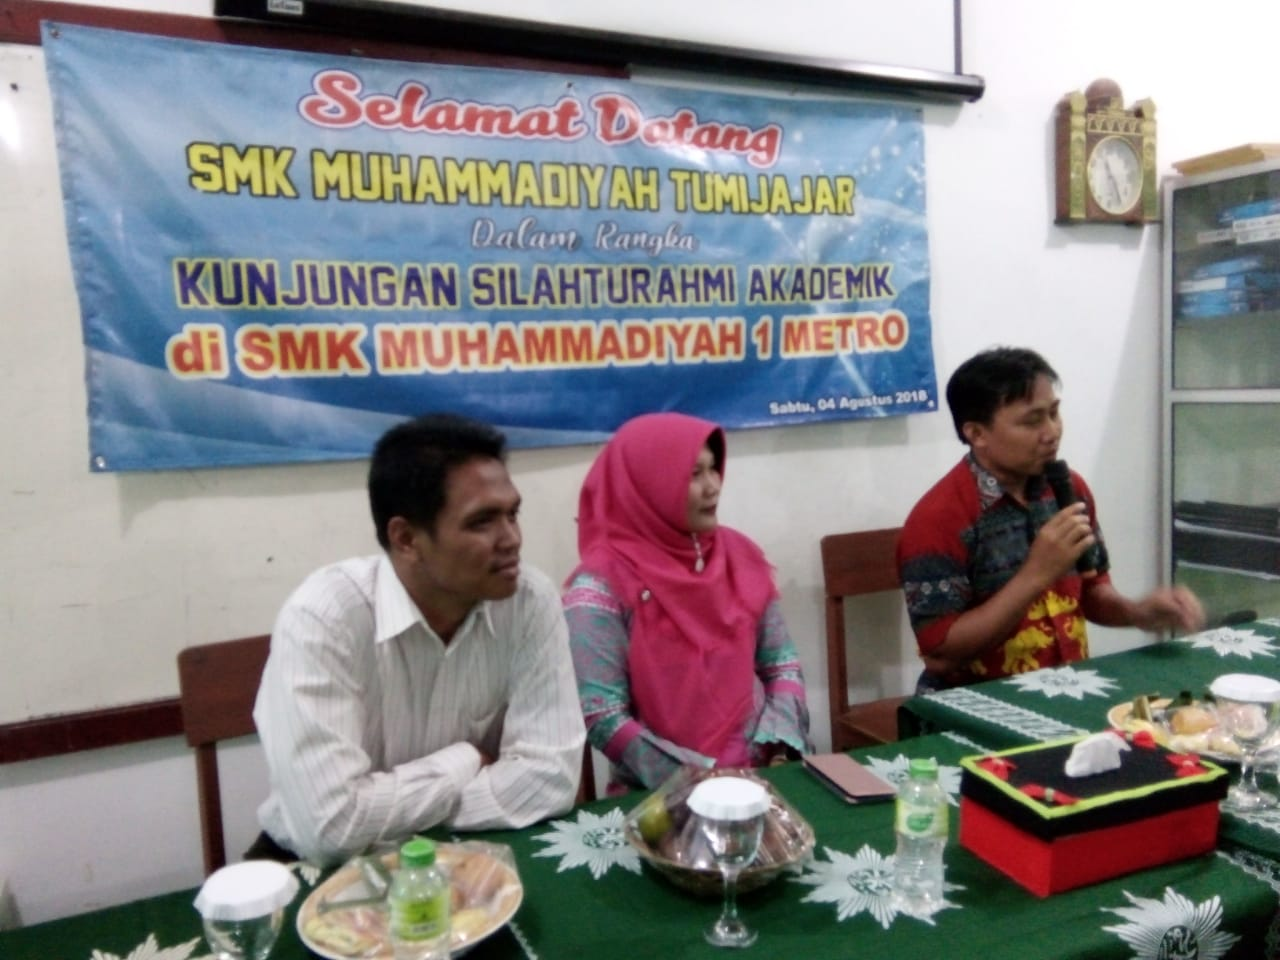 SMK Muhammadiyah 1 Metro Terima Kunjungan SMK Muhammadiyah Tumijajar